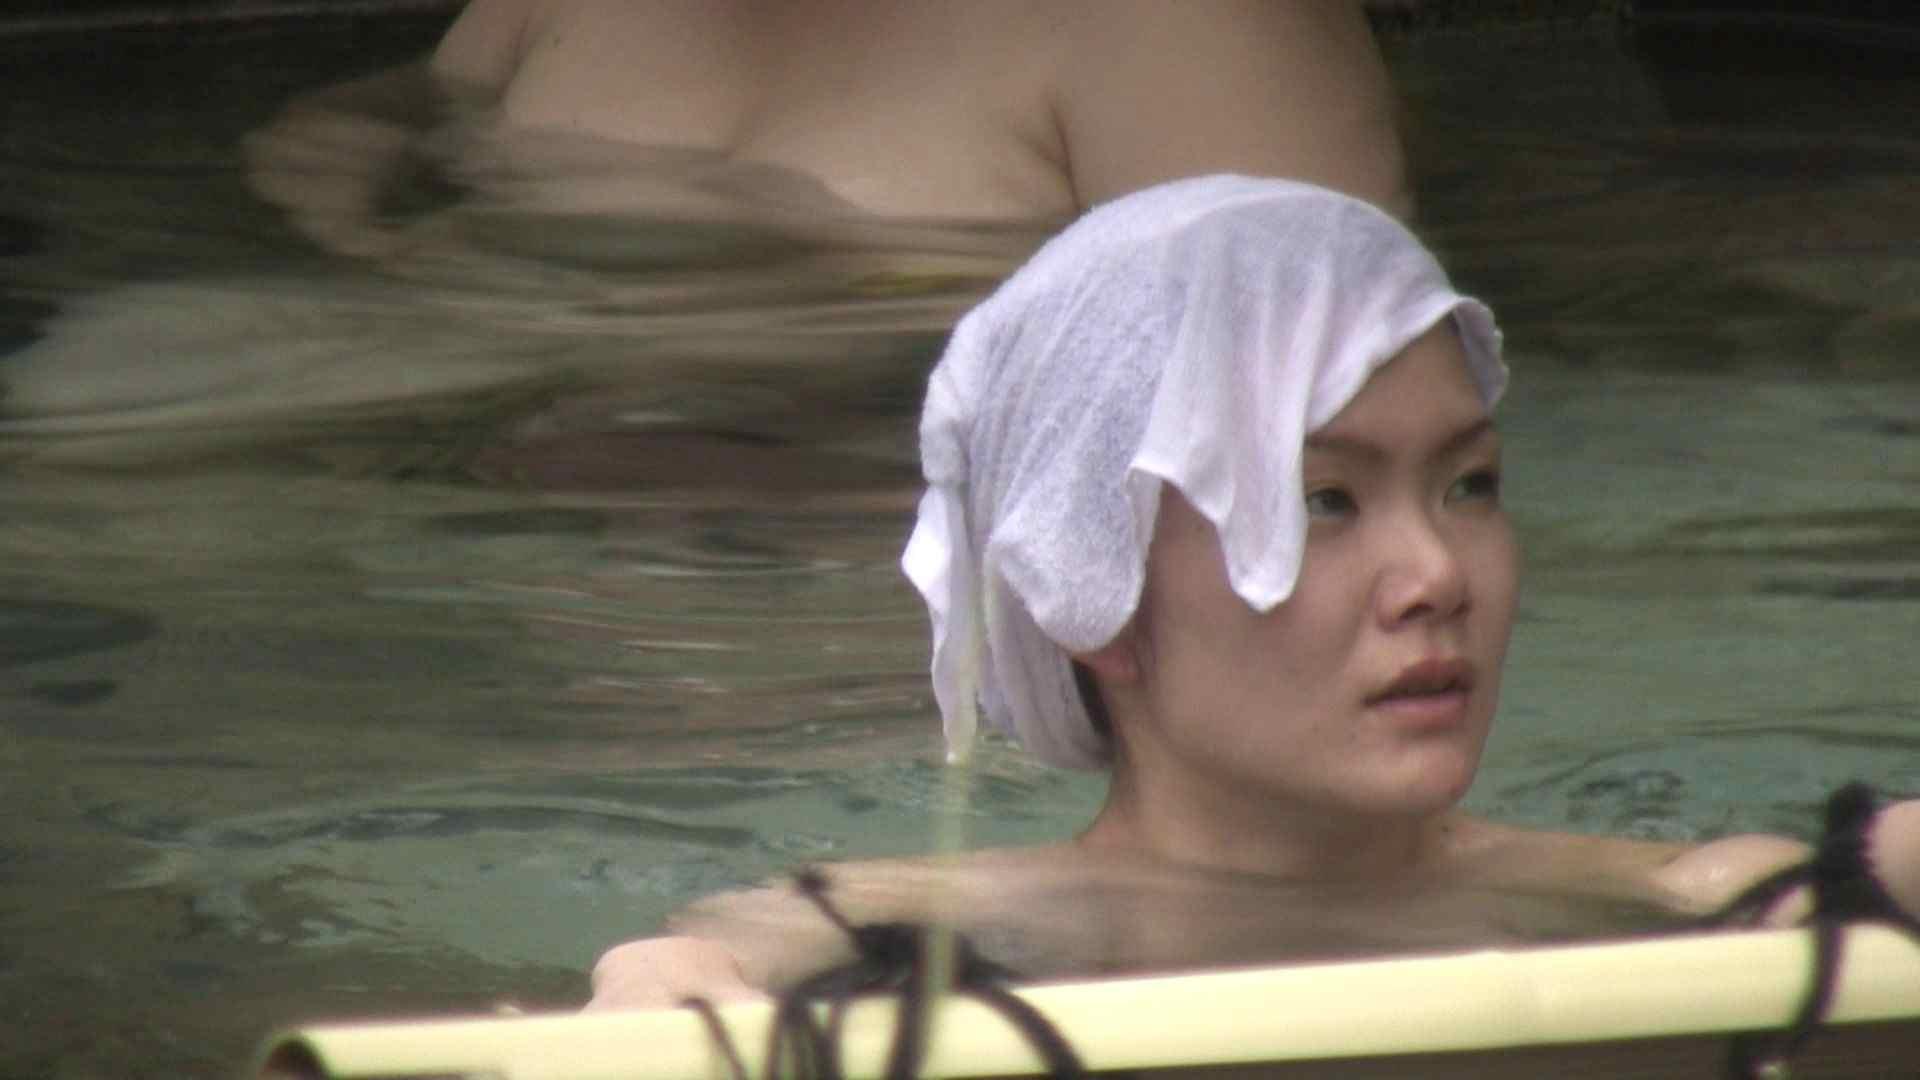 Aquaな露天風呂Vol.12【VIP】 HなOL | 盗撮  83pic 31